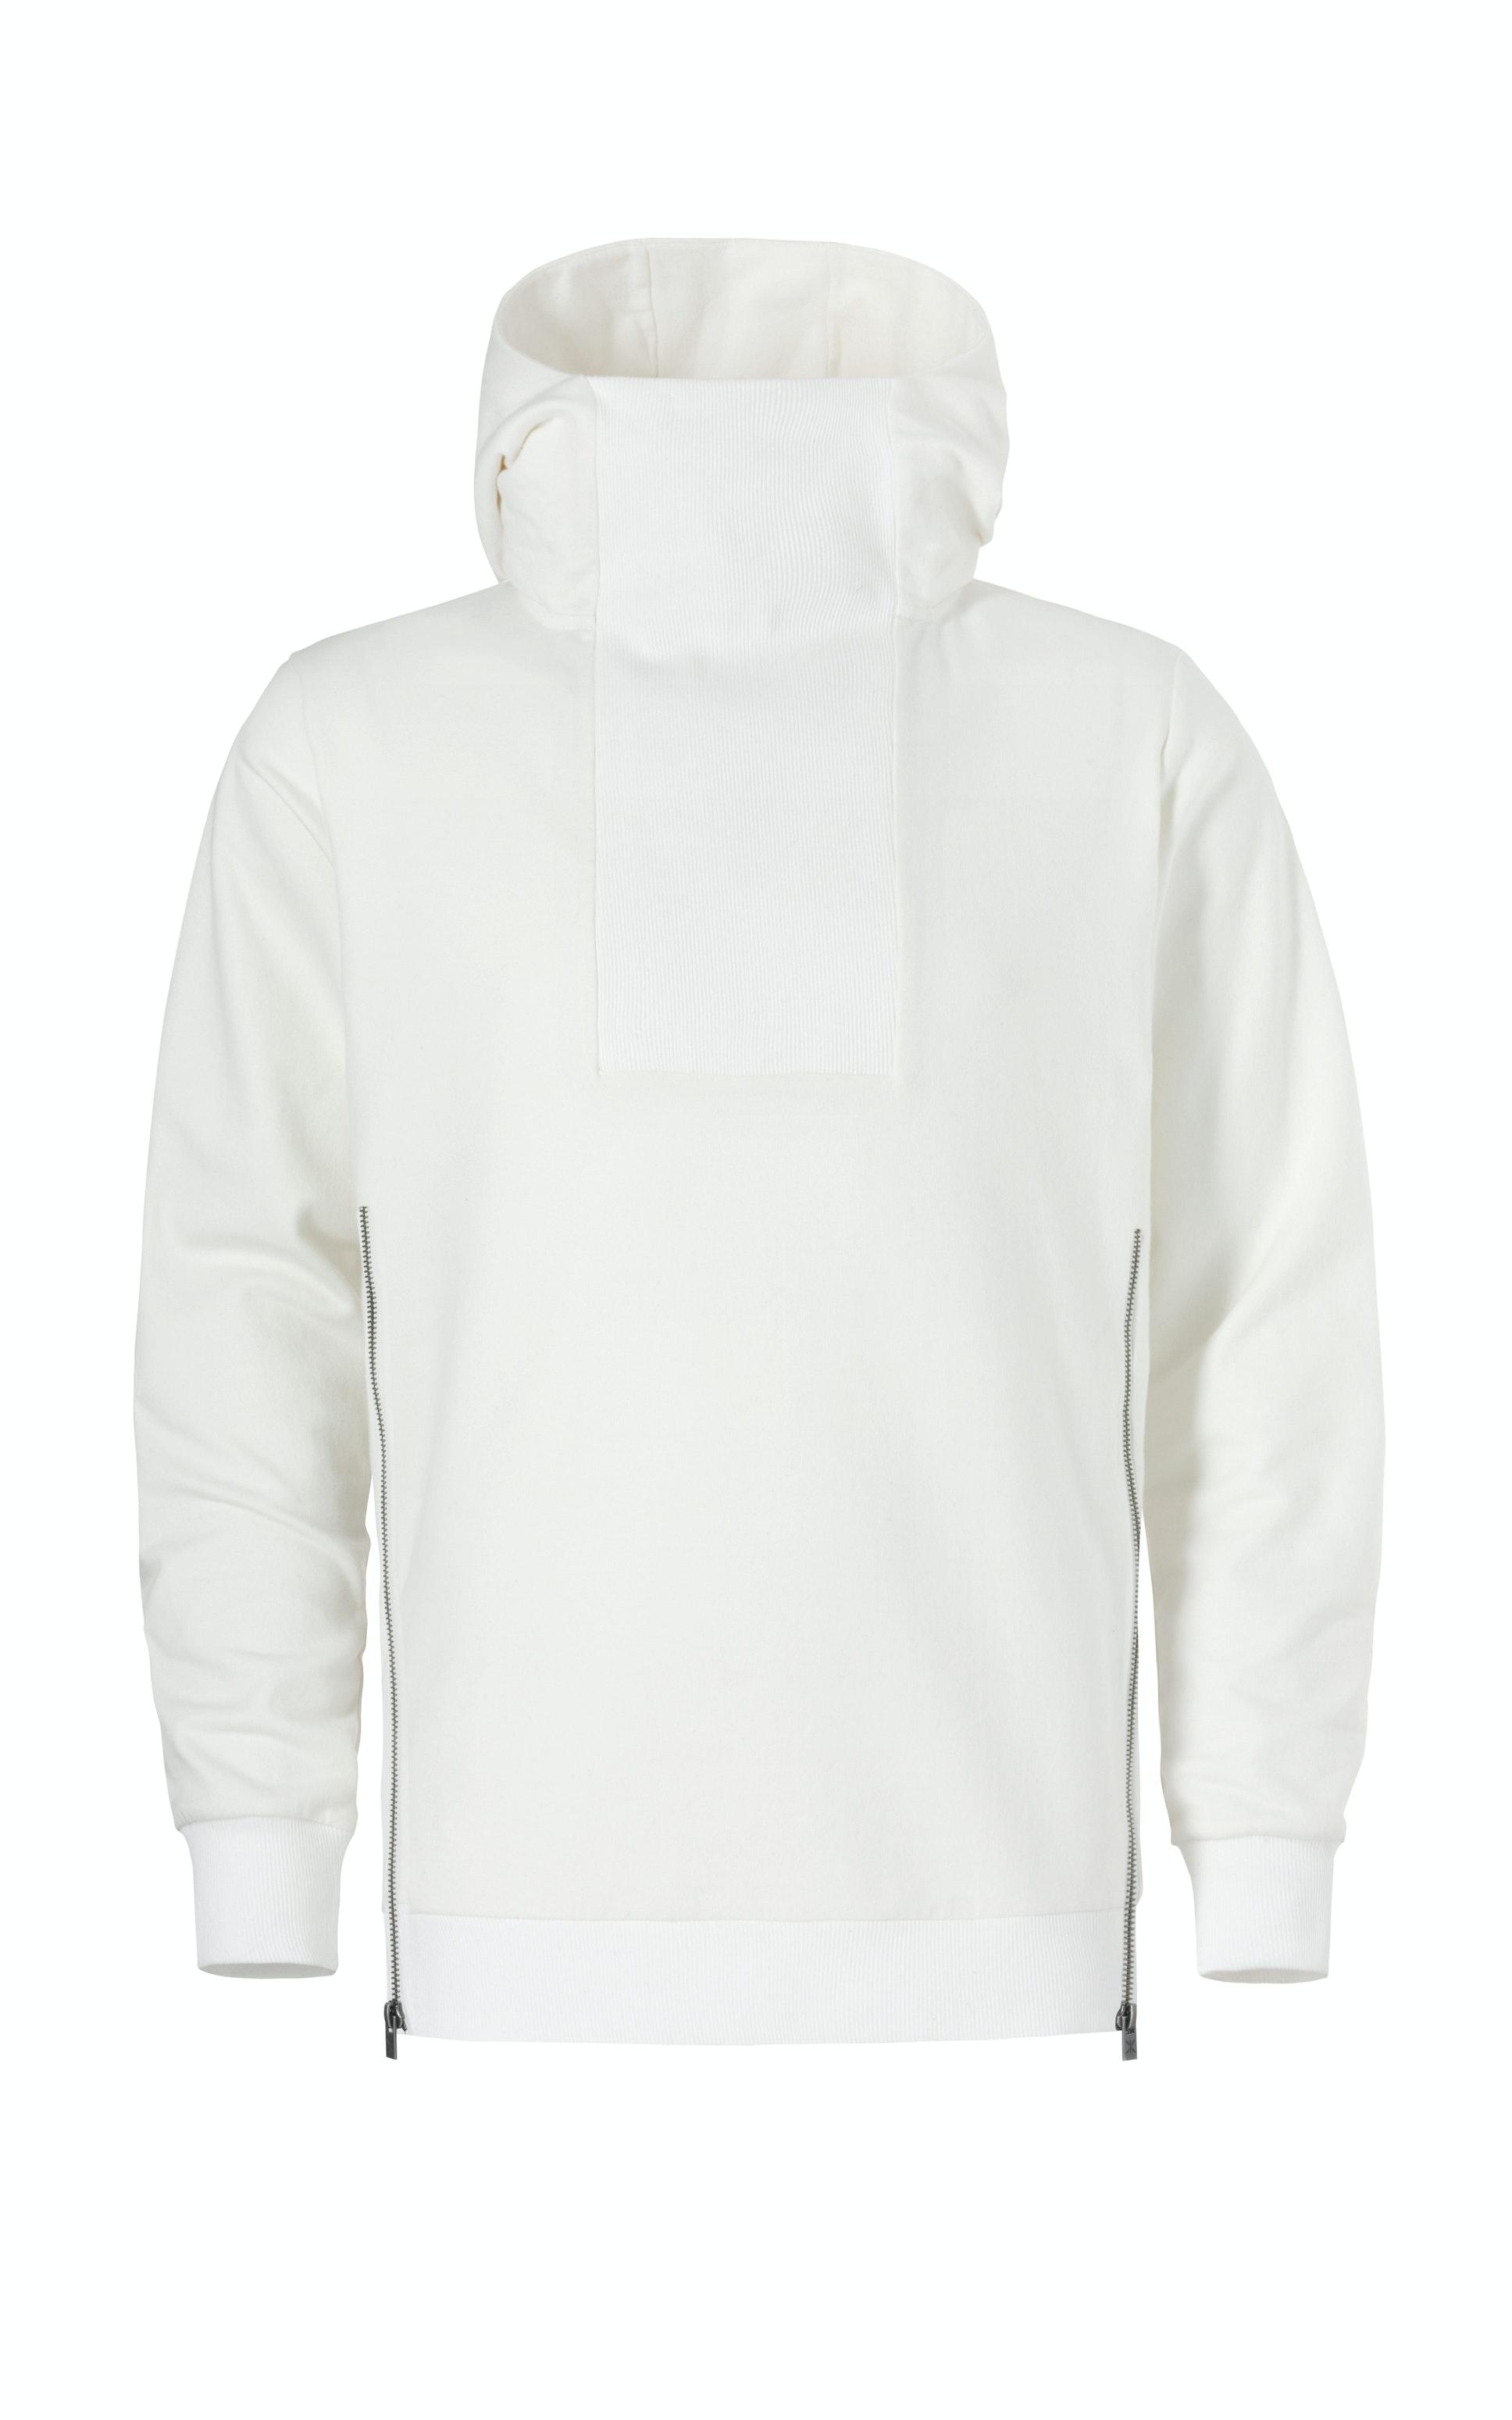 Snow white hoodie